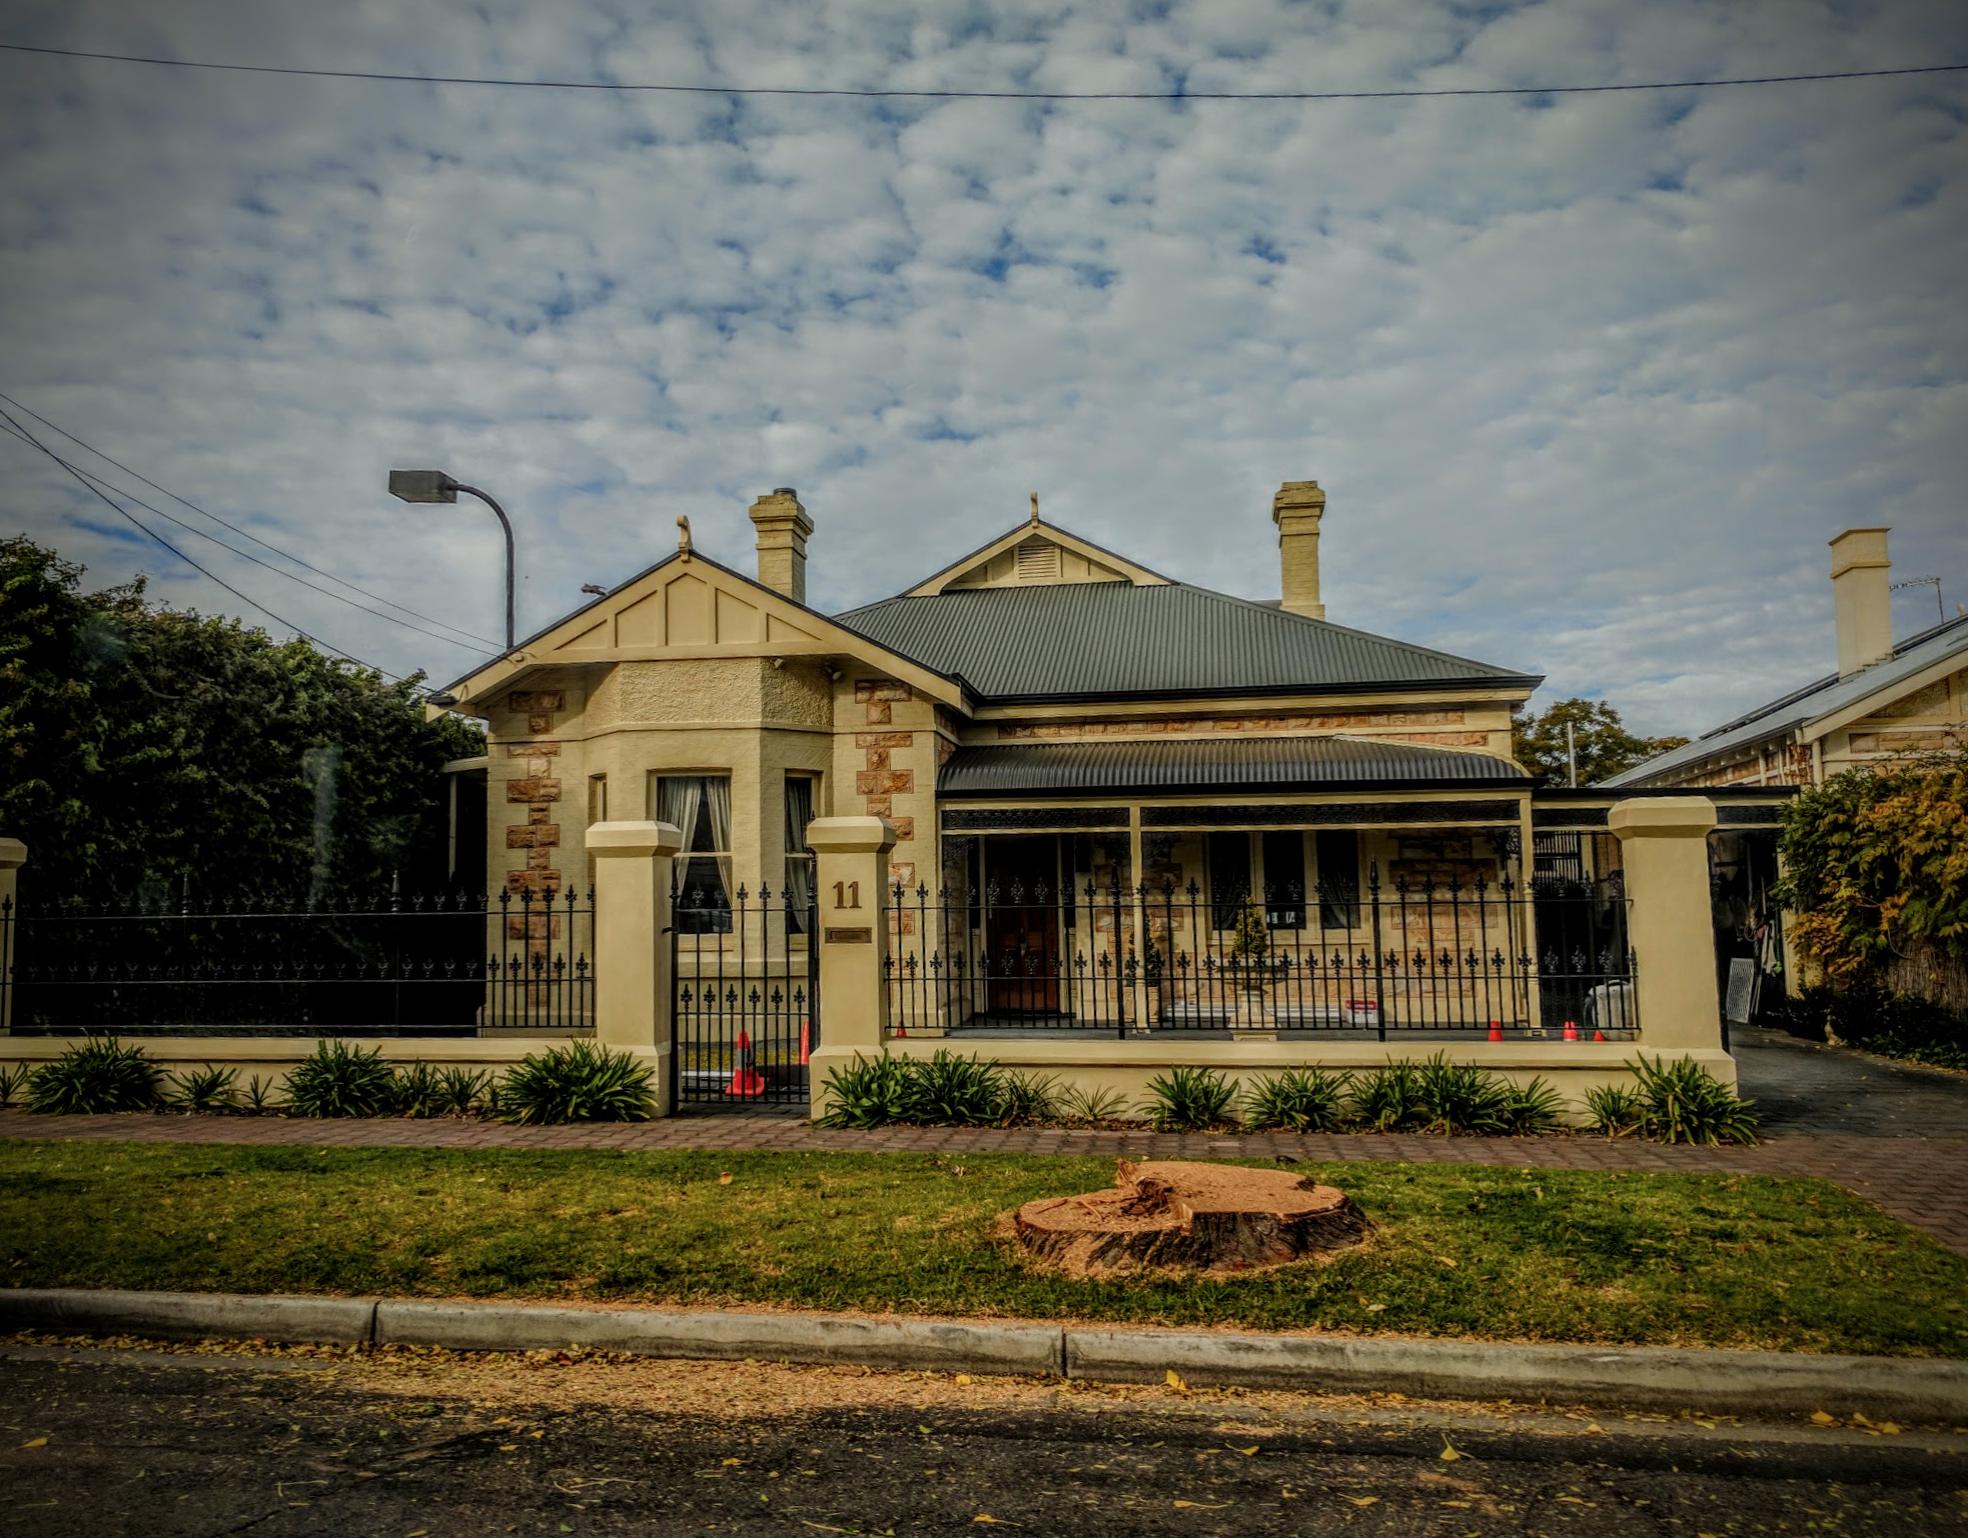 Bay Window Villa 1870-1890